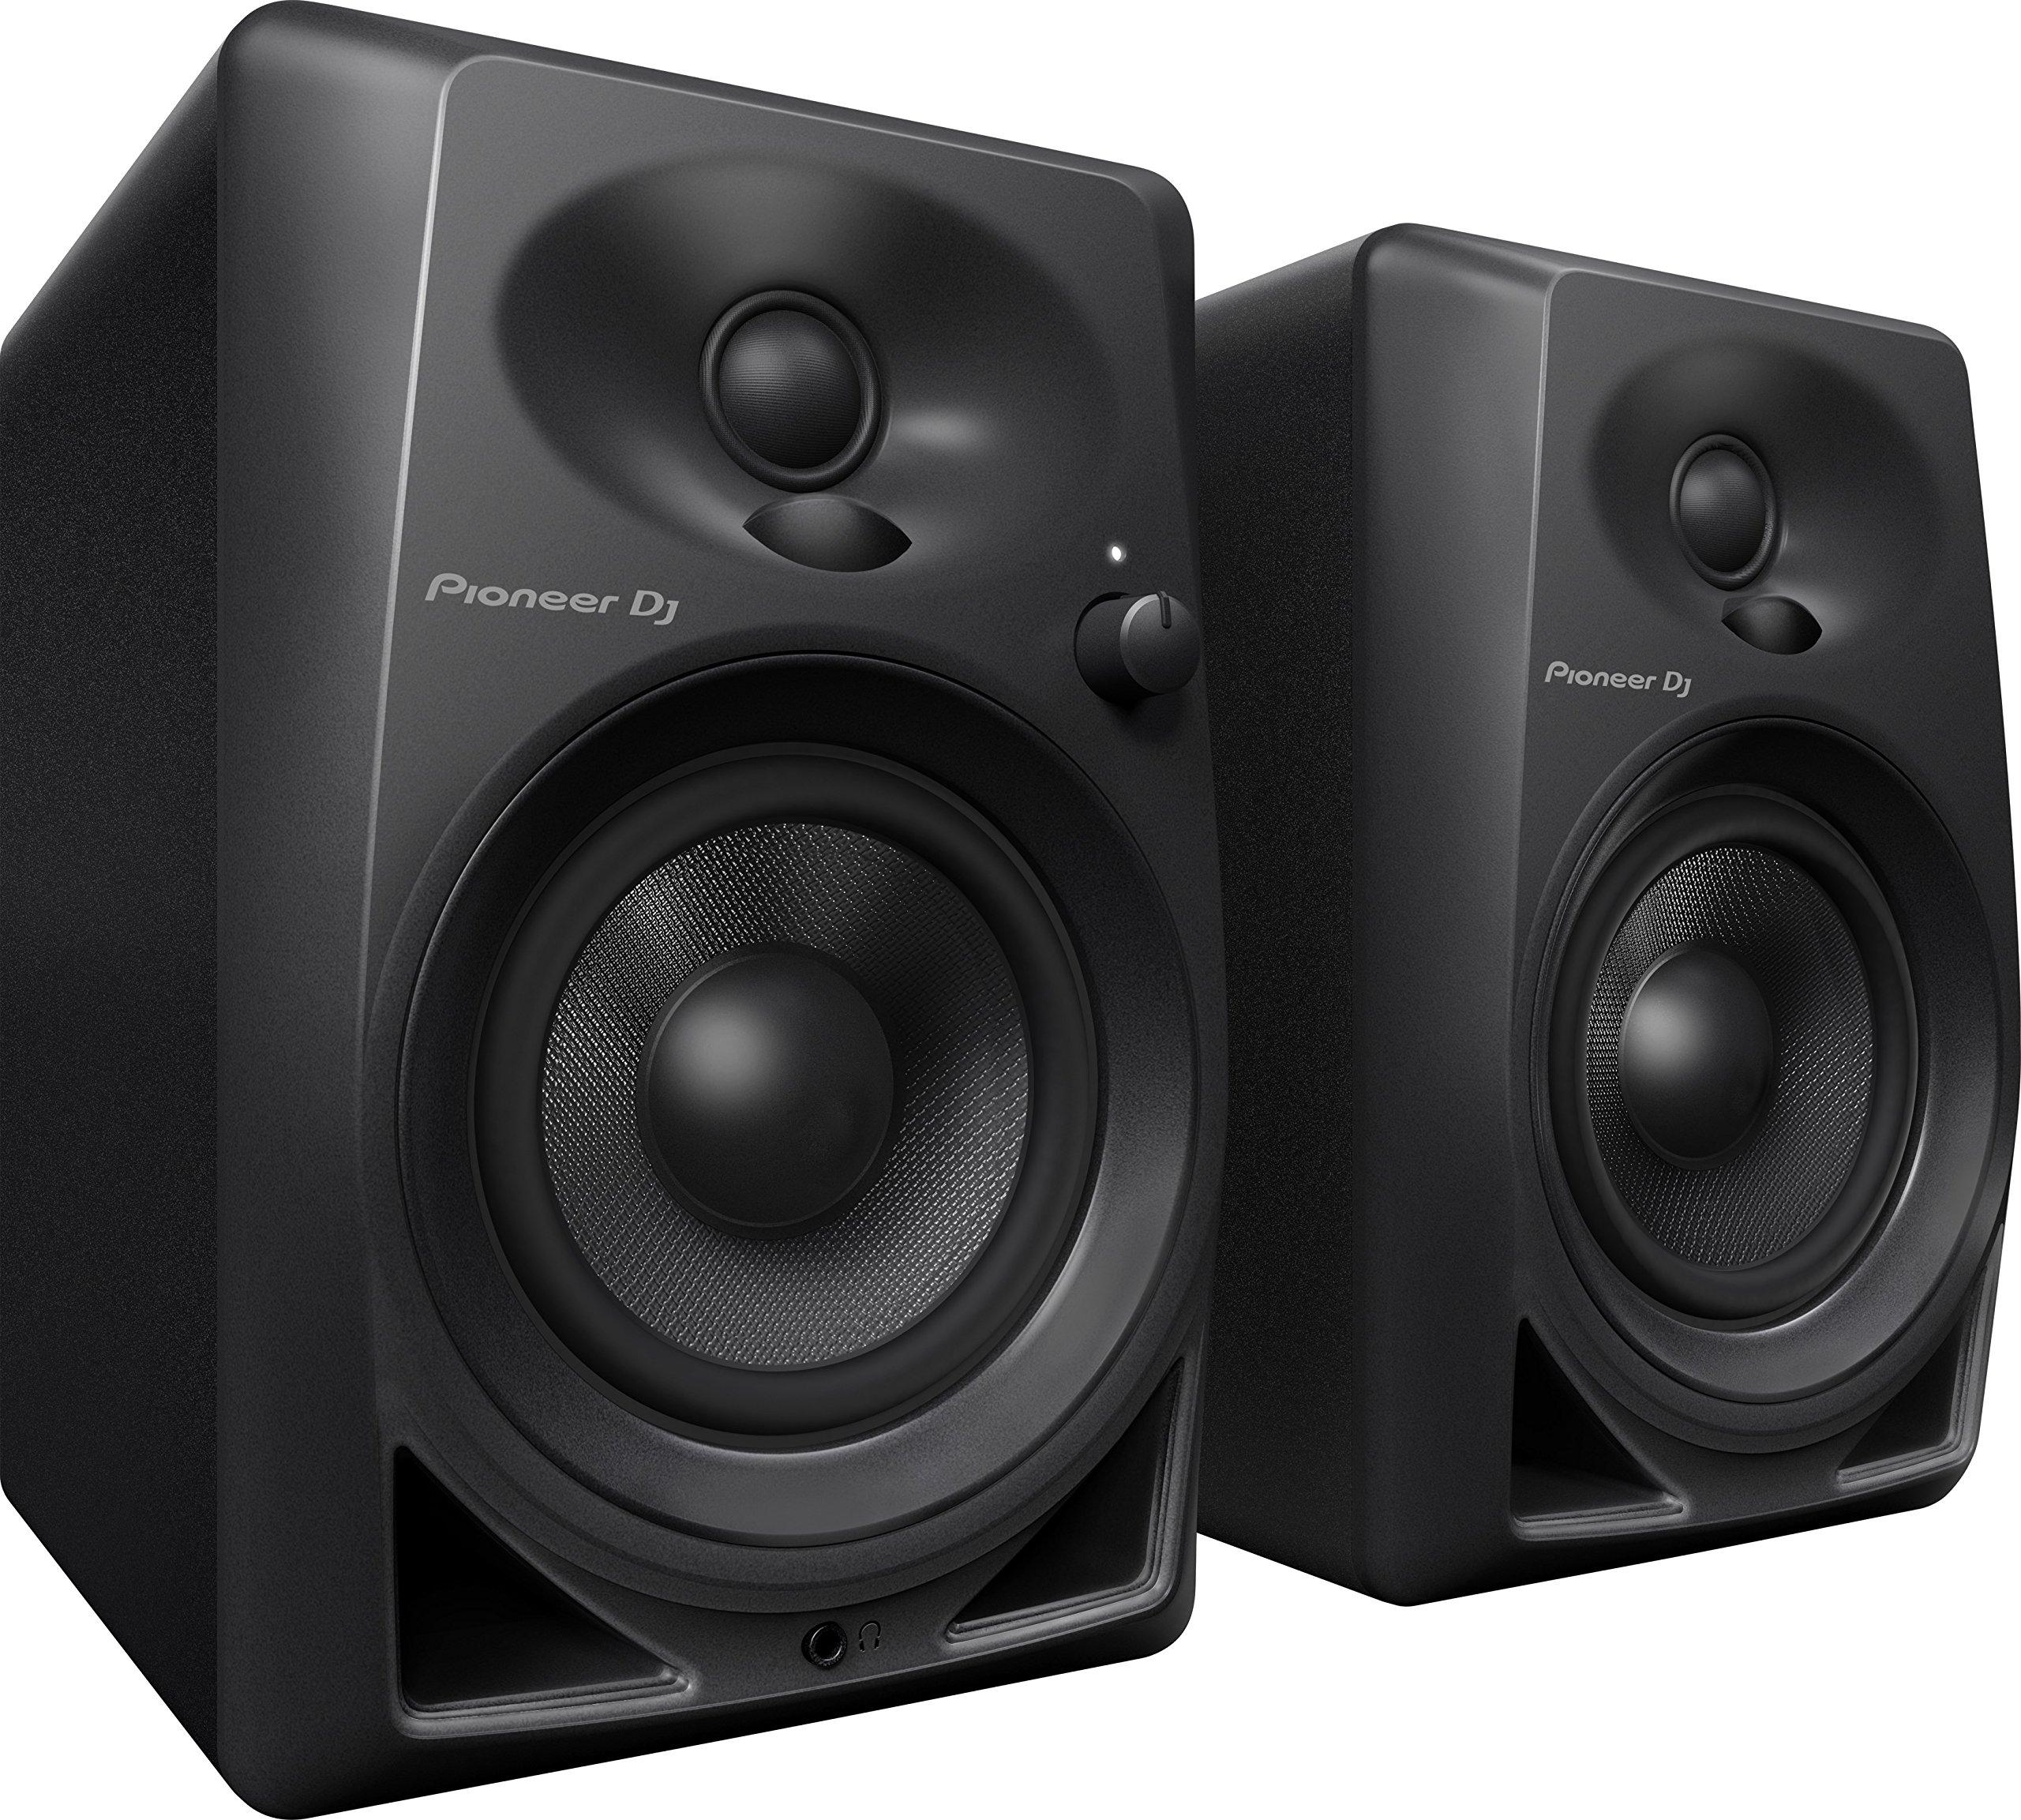 pioneer pro dj studio monitor rca mini jack black dm40 fifth degree. Black Bedroom Furniture Sets. Home Design Ideas